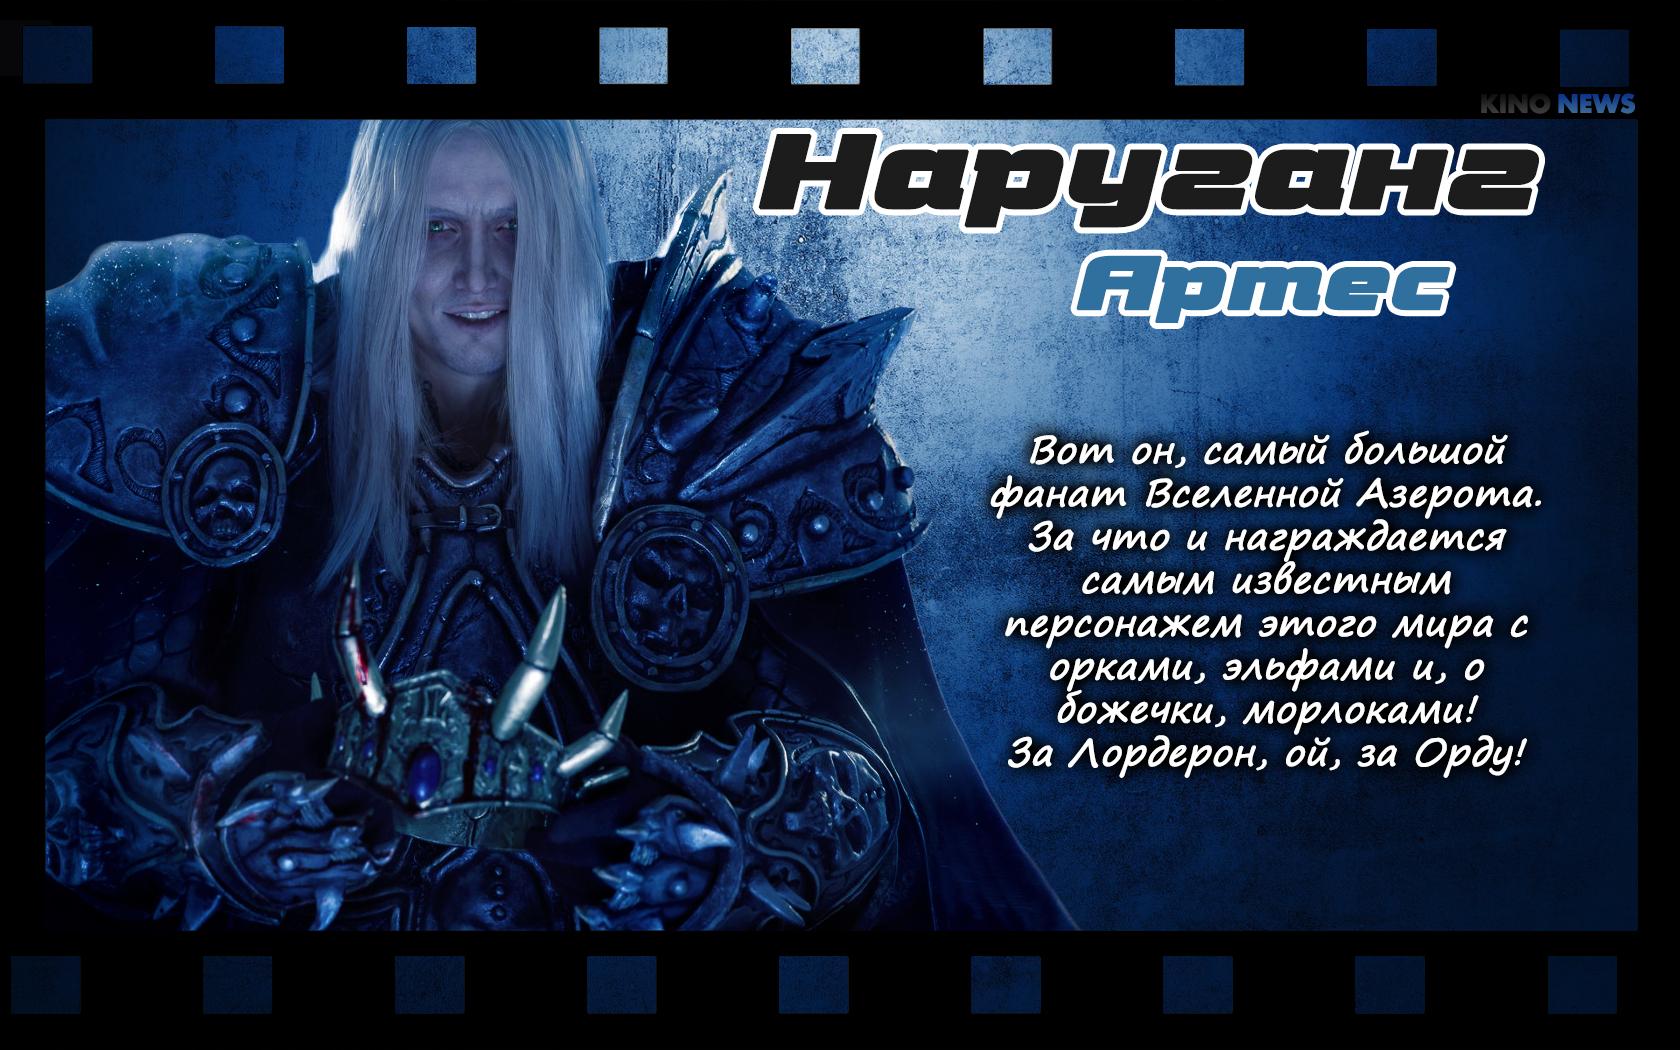 https://www.kinonews.ru/insimgs/2017/persimg/persimg77944_64.jpg